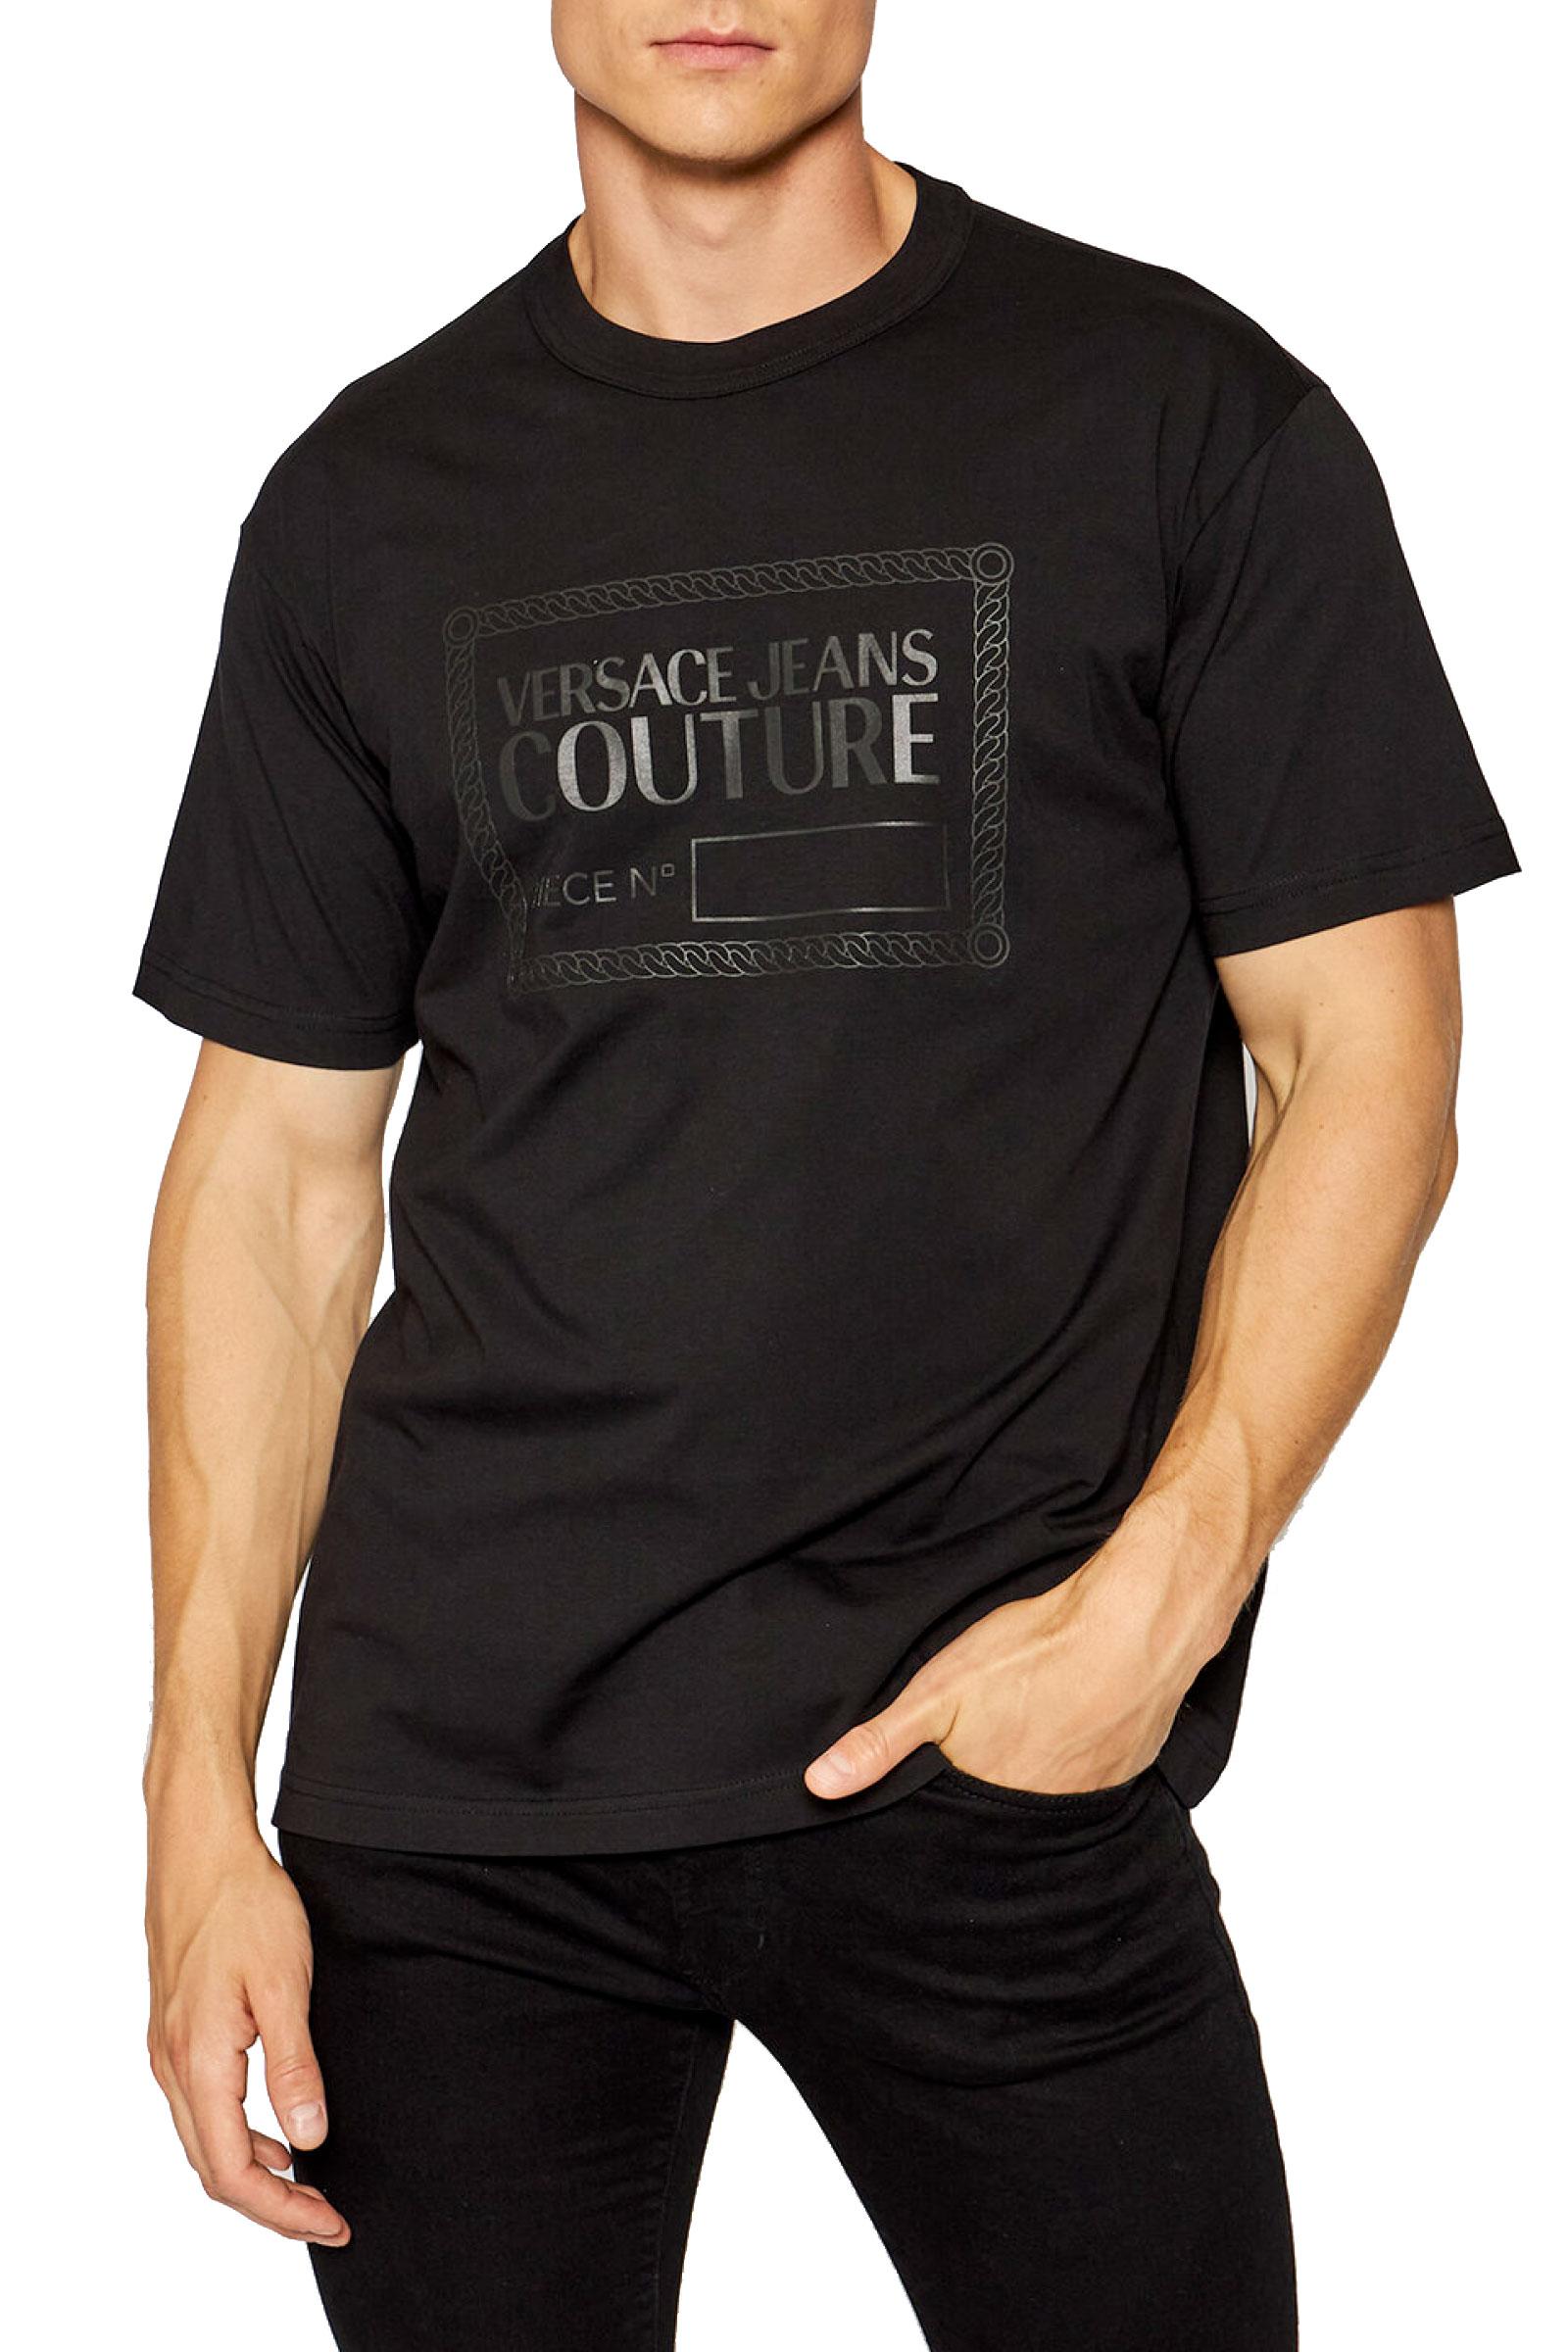 T-Shirt Uomo VERSACE JEANS COUTURE | T-Shirt | 71GAHT13 CJ00T899